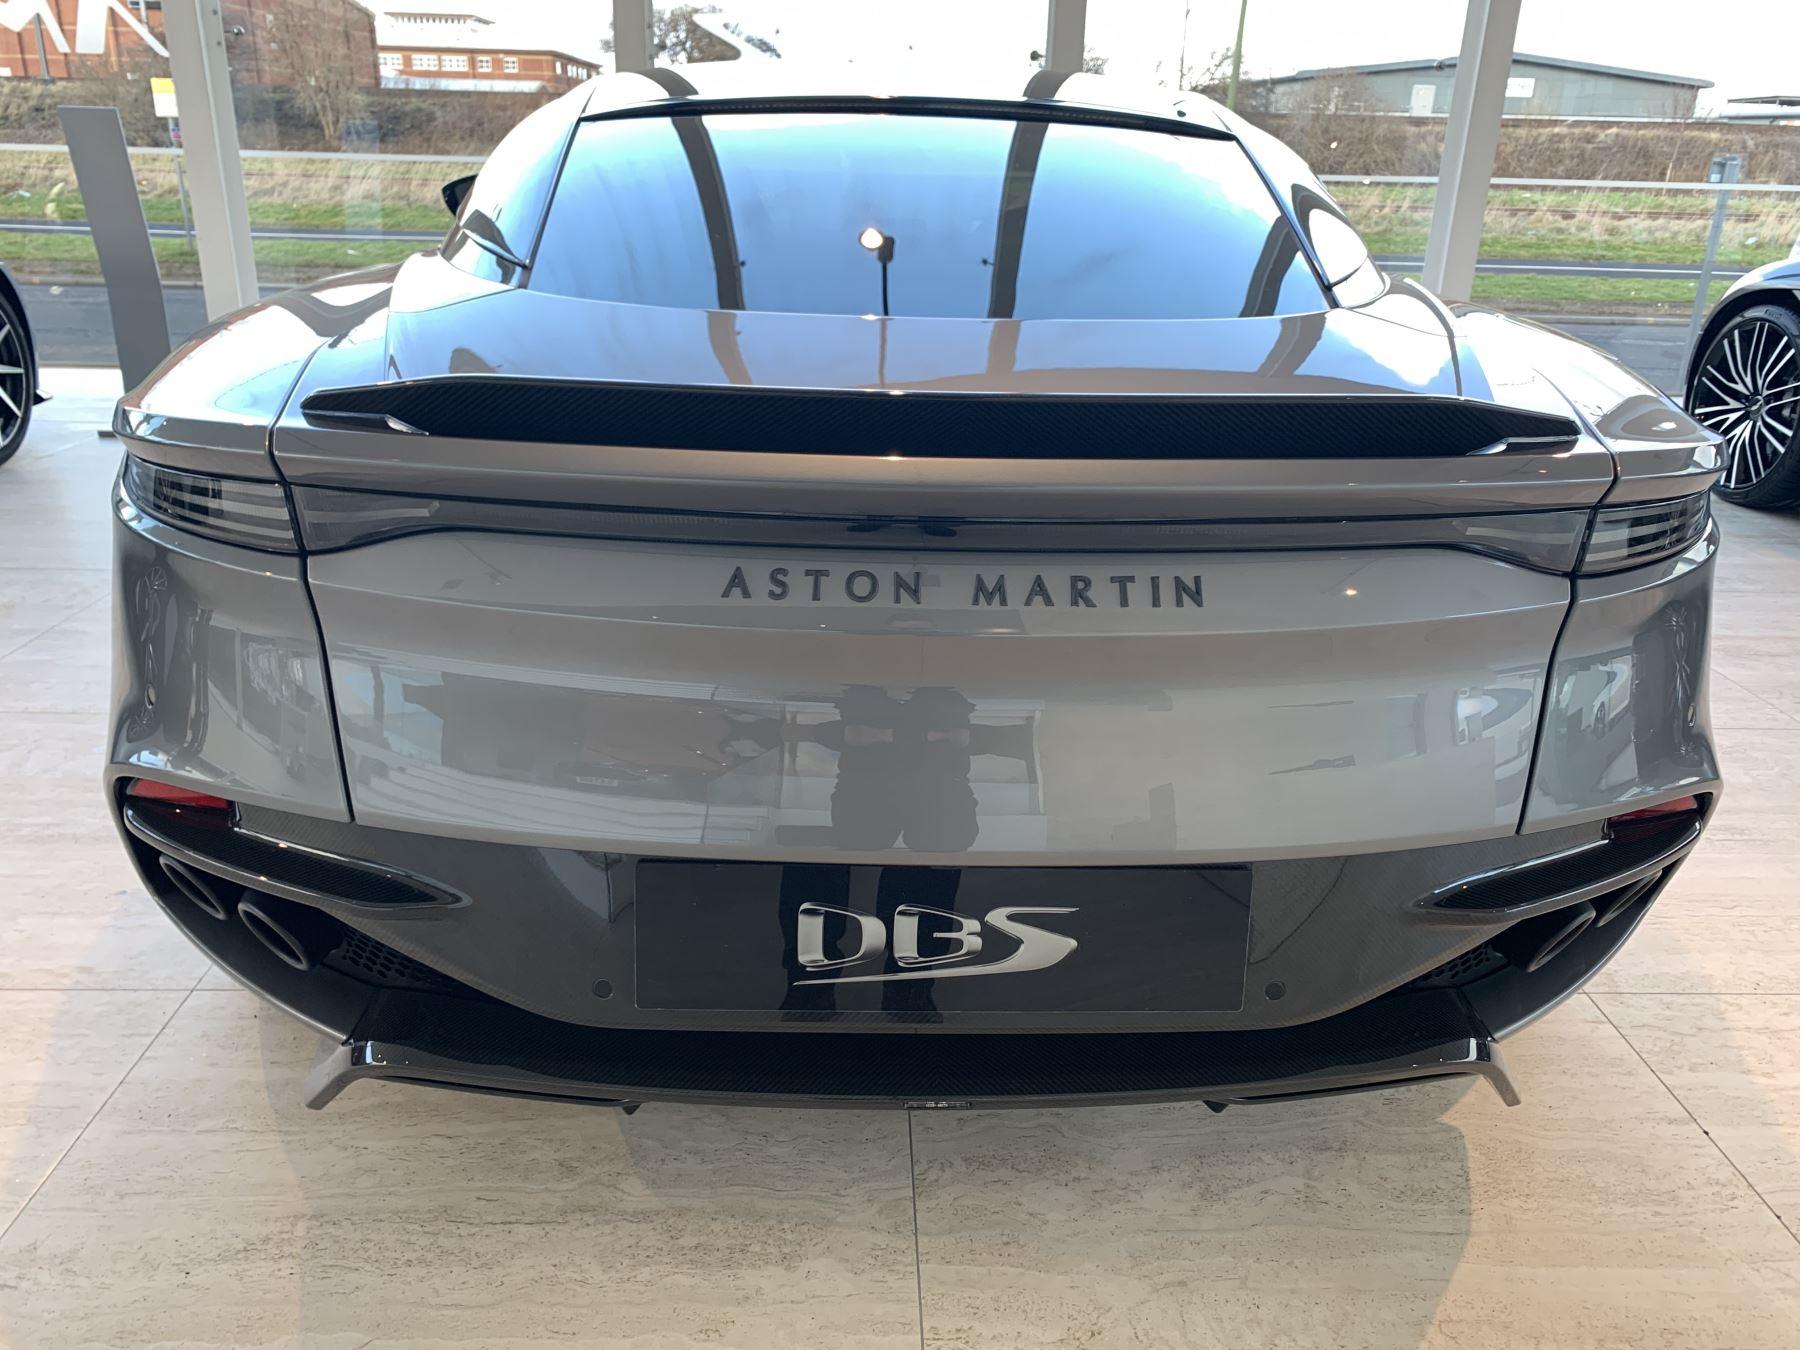 Aston Martin DBS Superleggera V12 Superleggera 2dr Touchtronic Auto image 5